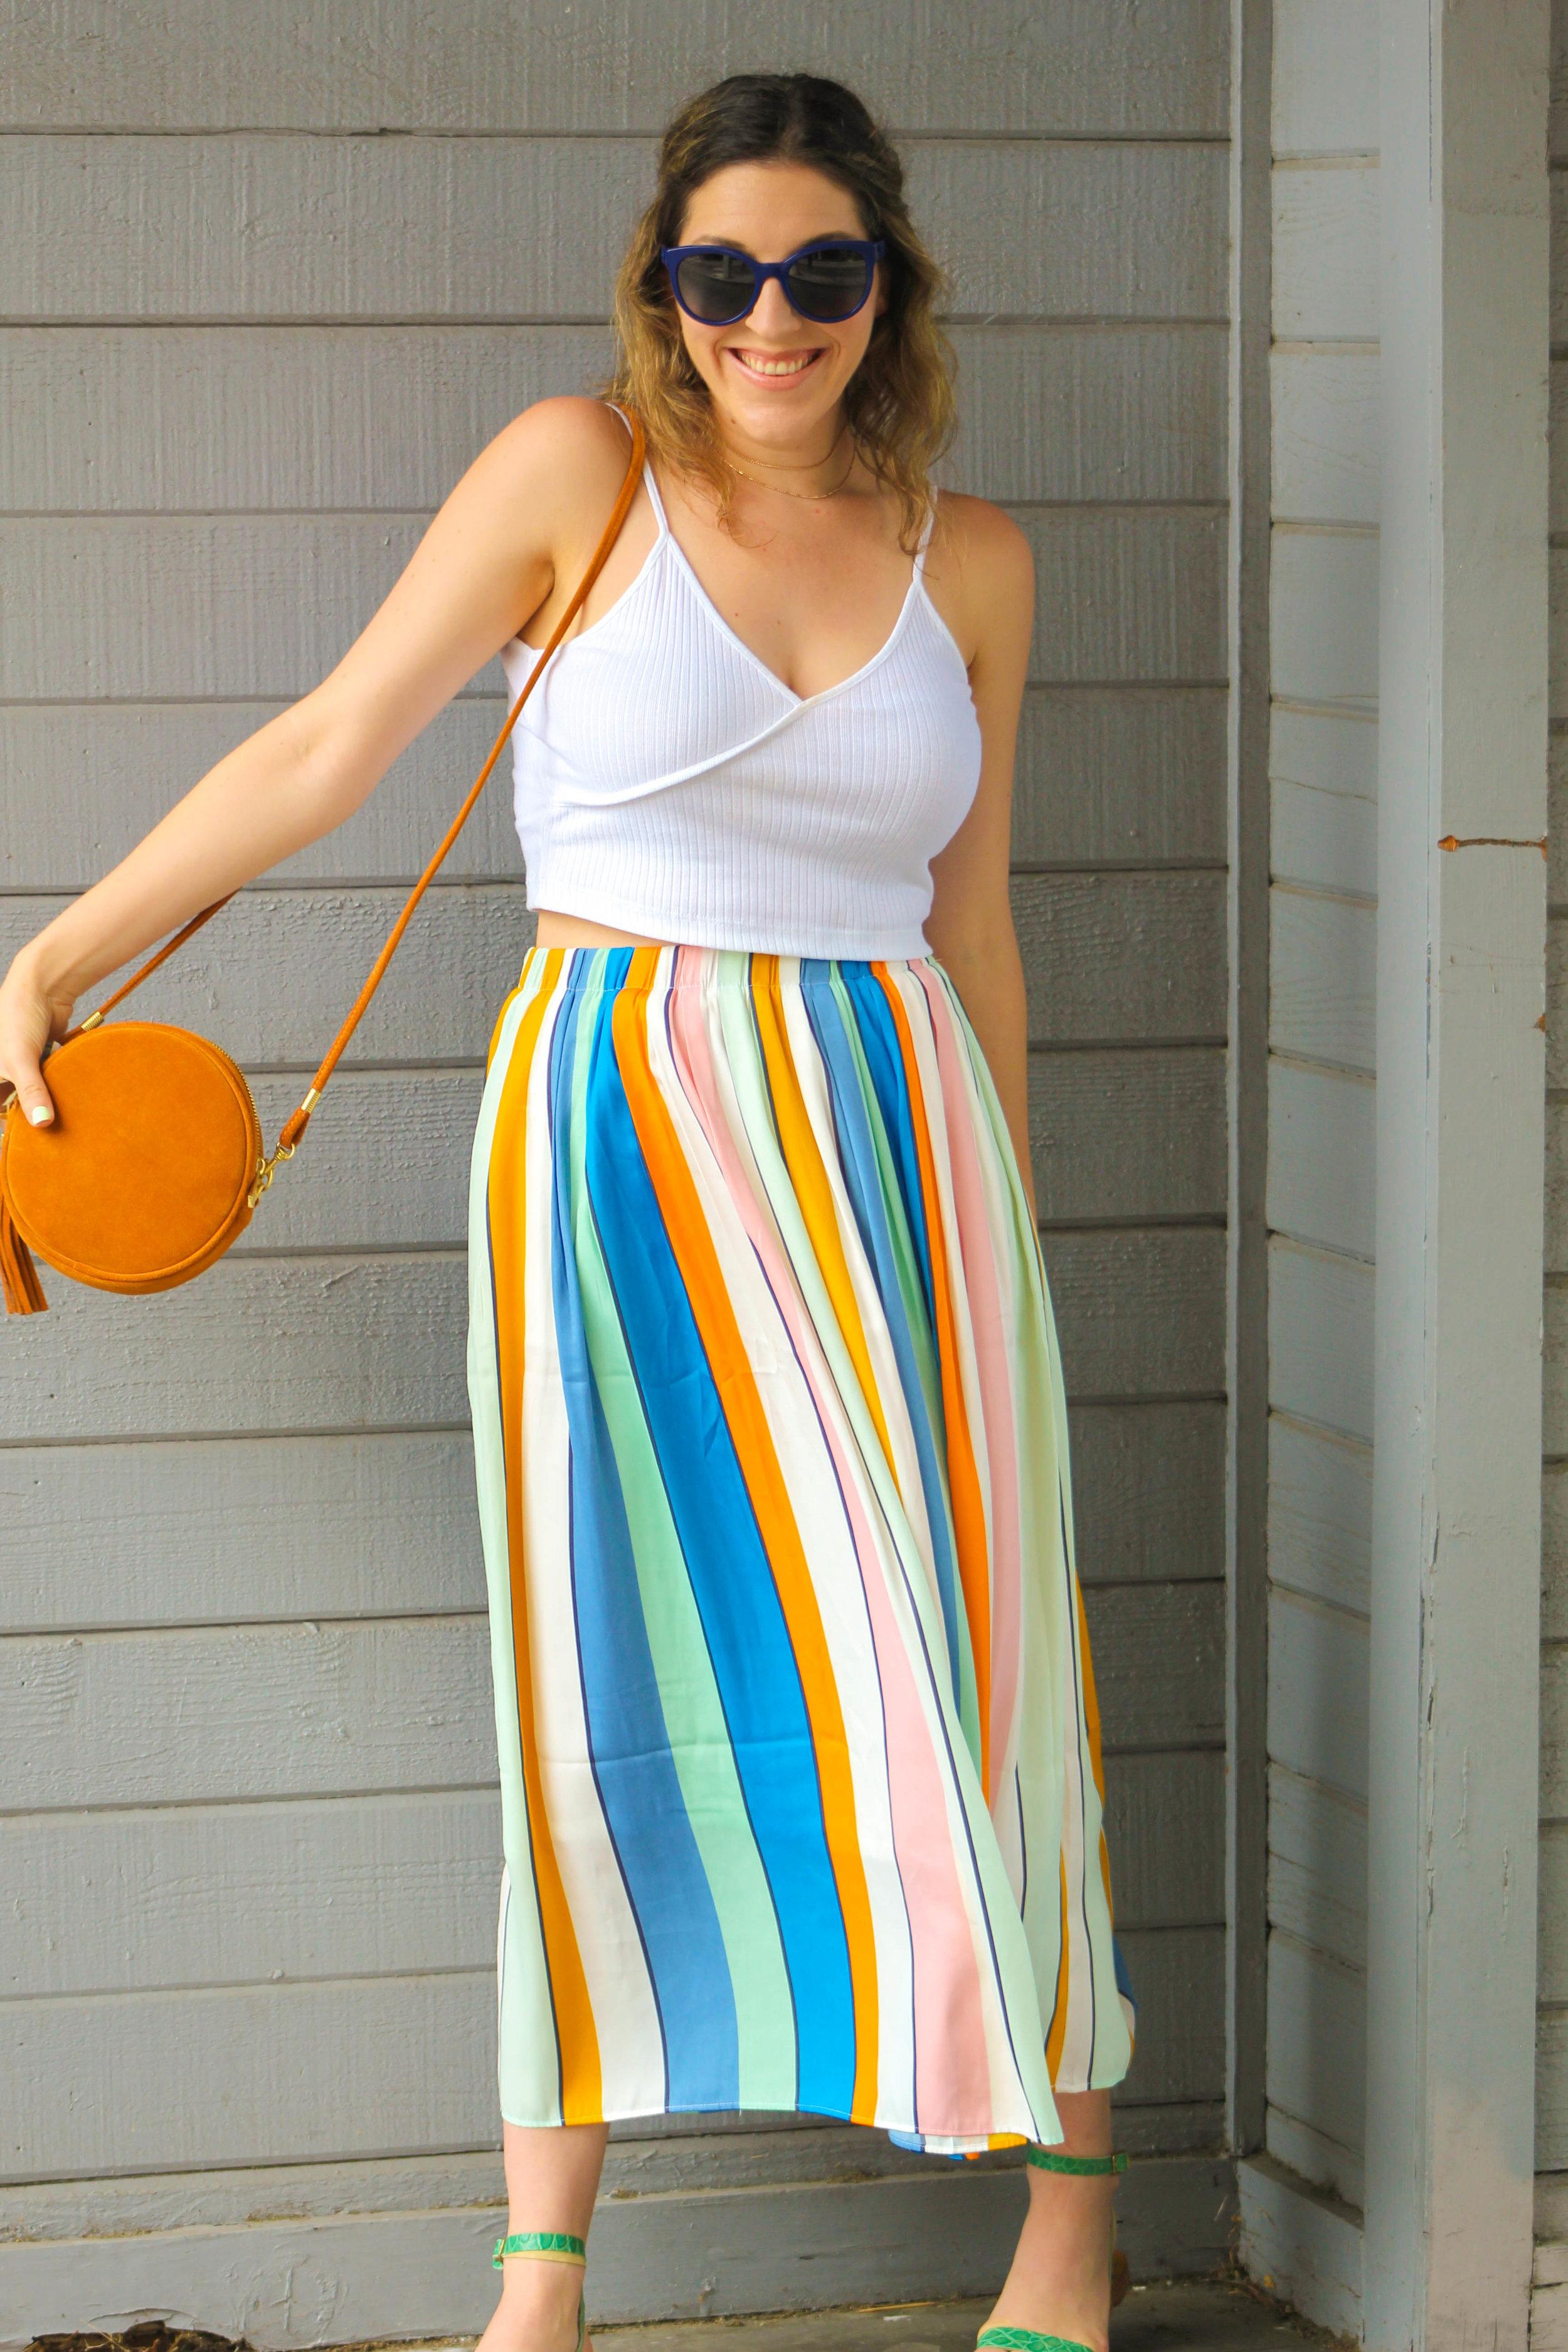 Top :  Topshop  //  Skirt :  Loft  //  Sandals : Kate Spade, similar   here   //  Purse : F21, similar   here   //  Sunnies :  Chanel